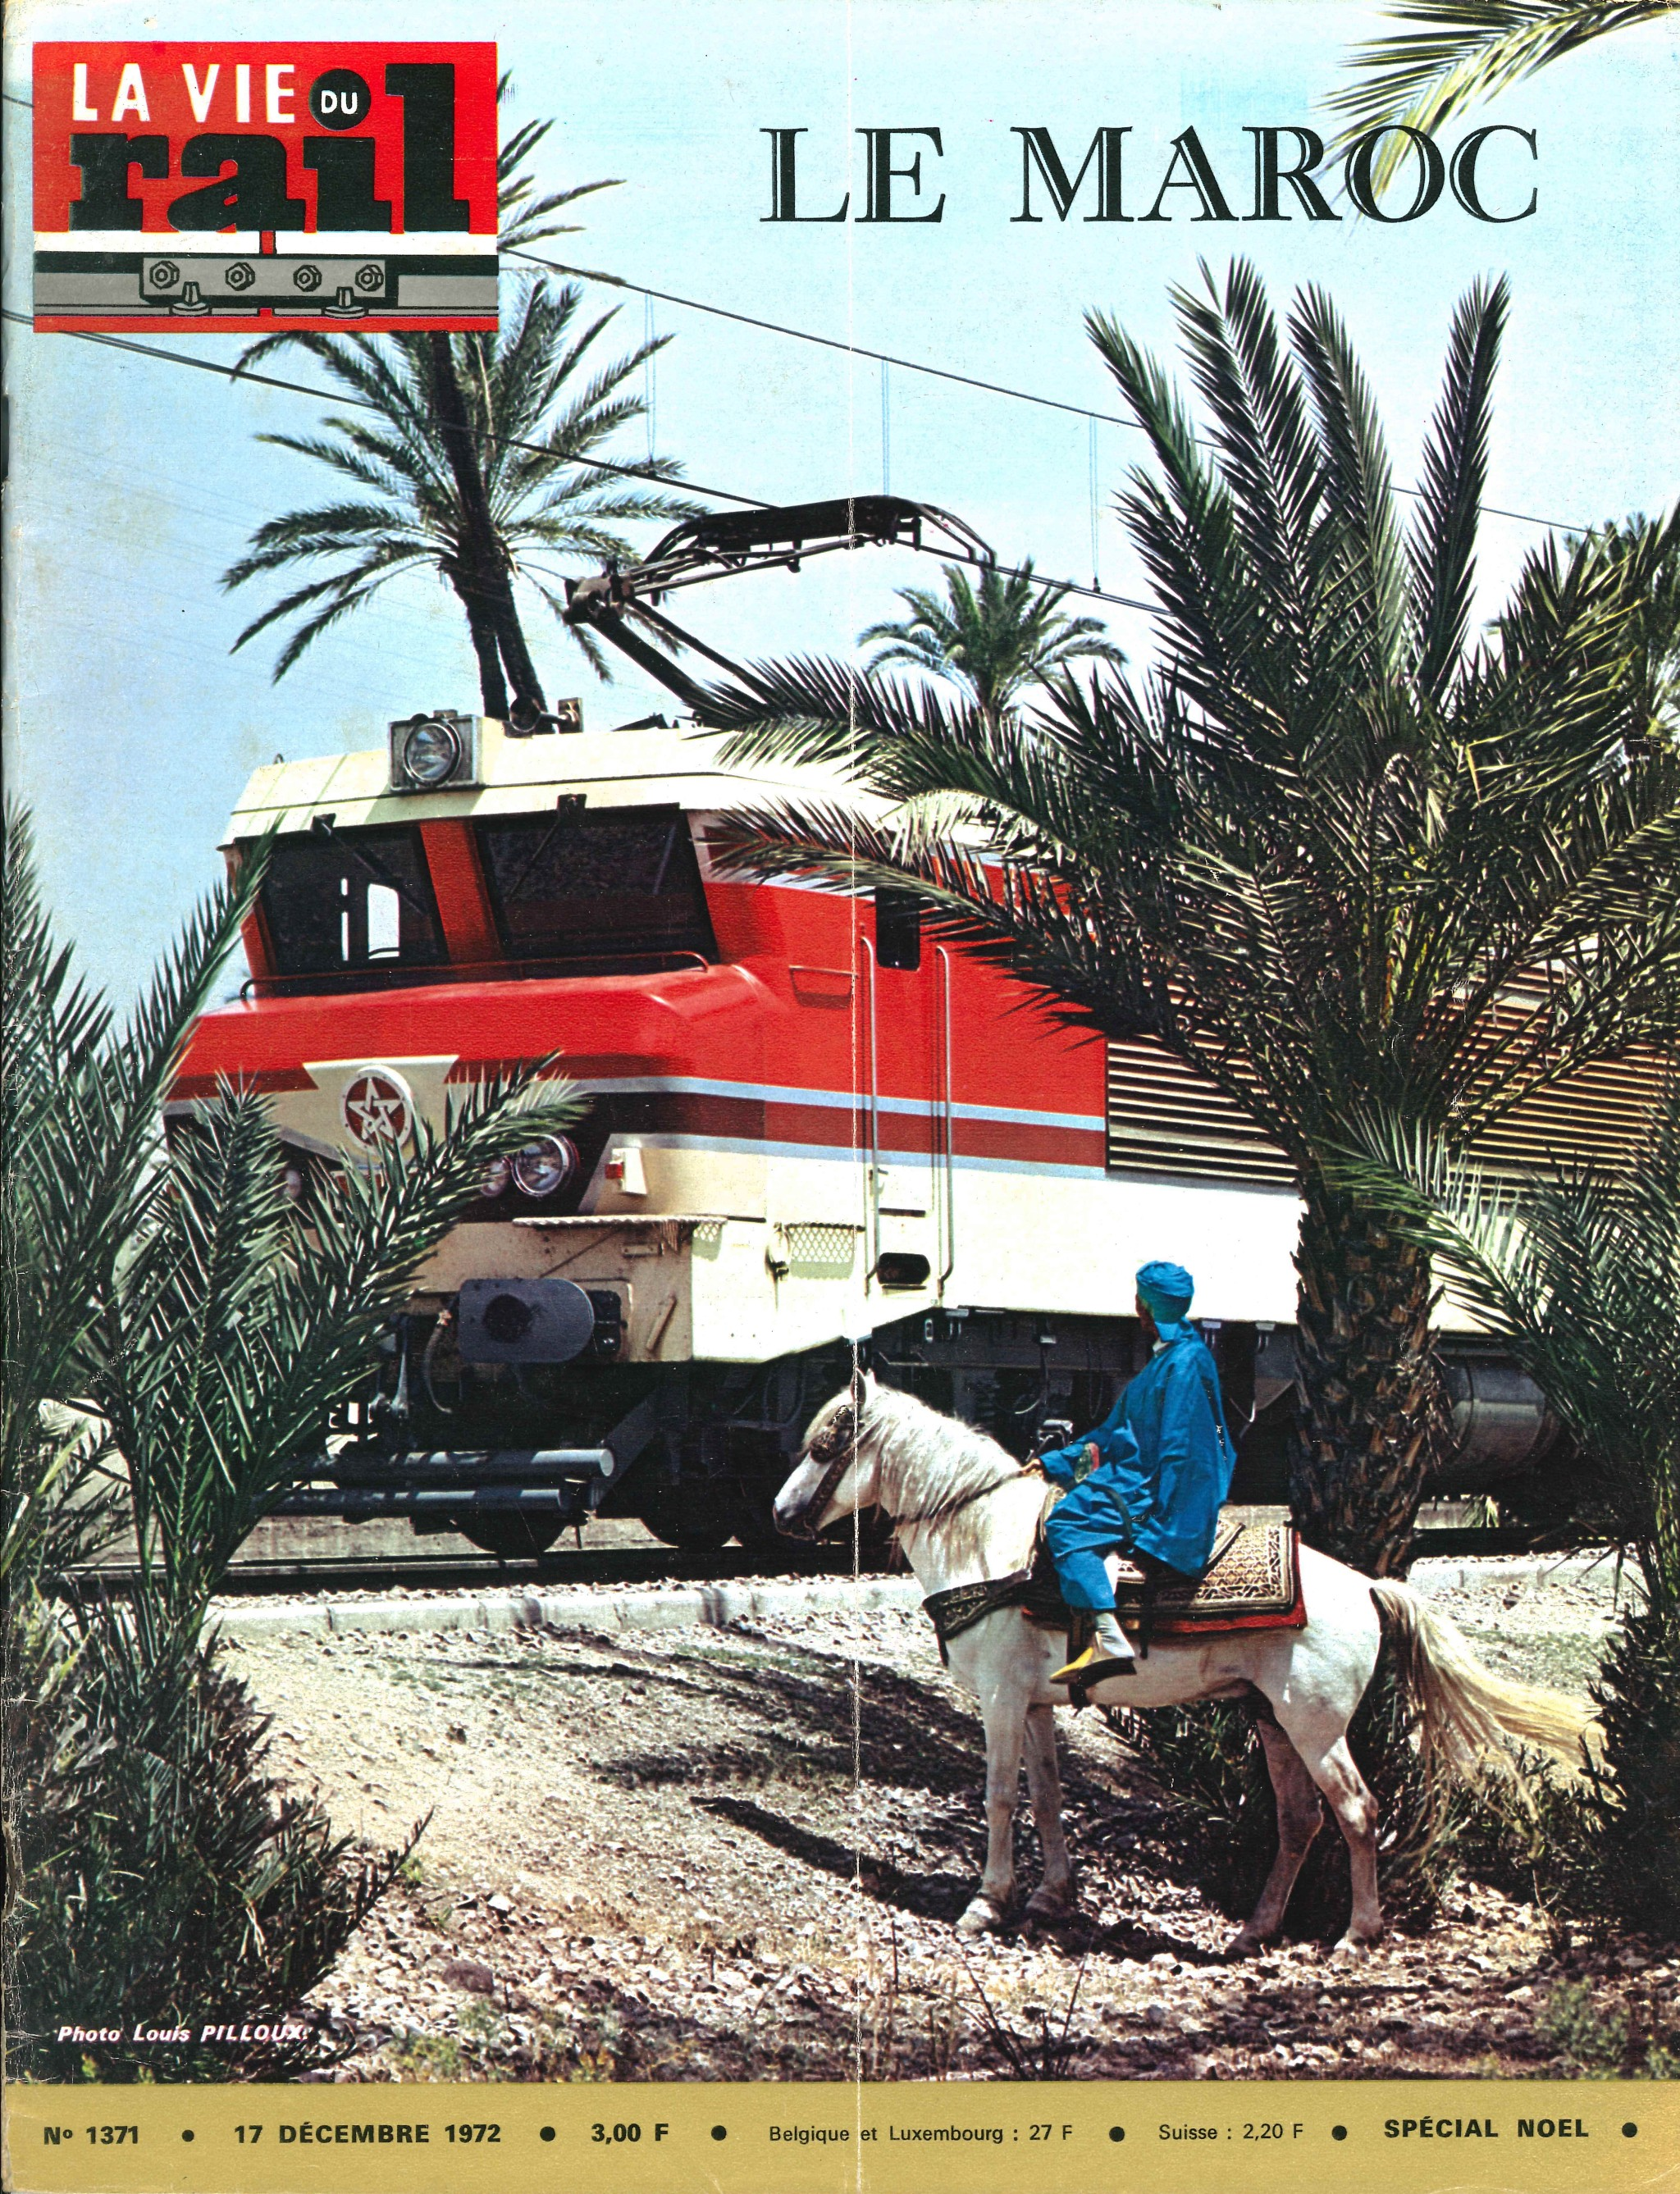 Chemins de Fer au Maroc - ONCF  - Page 2 49429827541_b5977b7280_3k